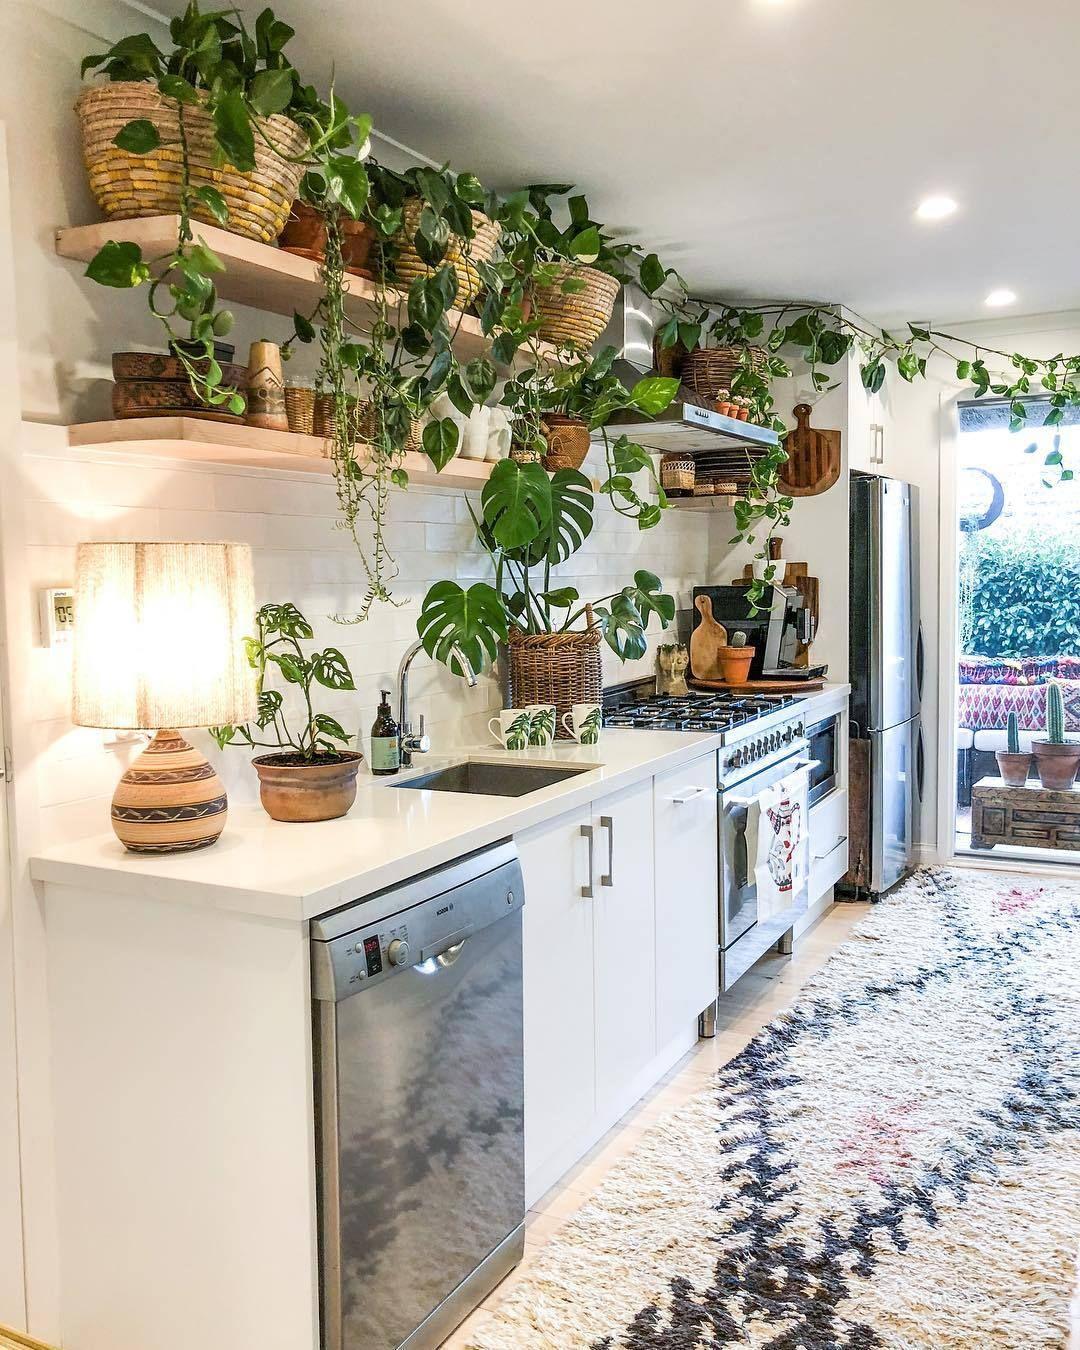 Urban Jungle na cozinha